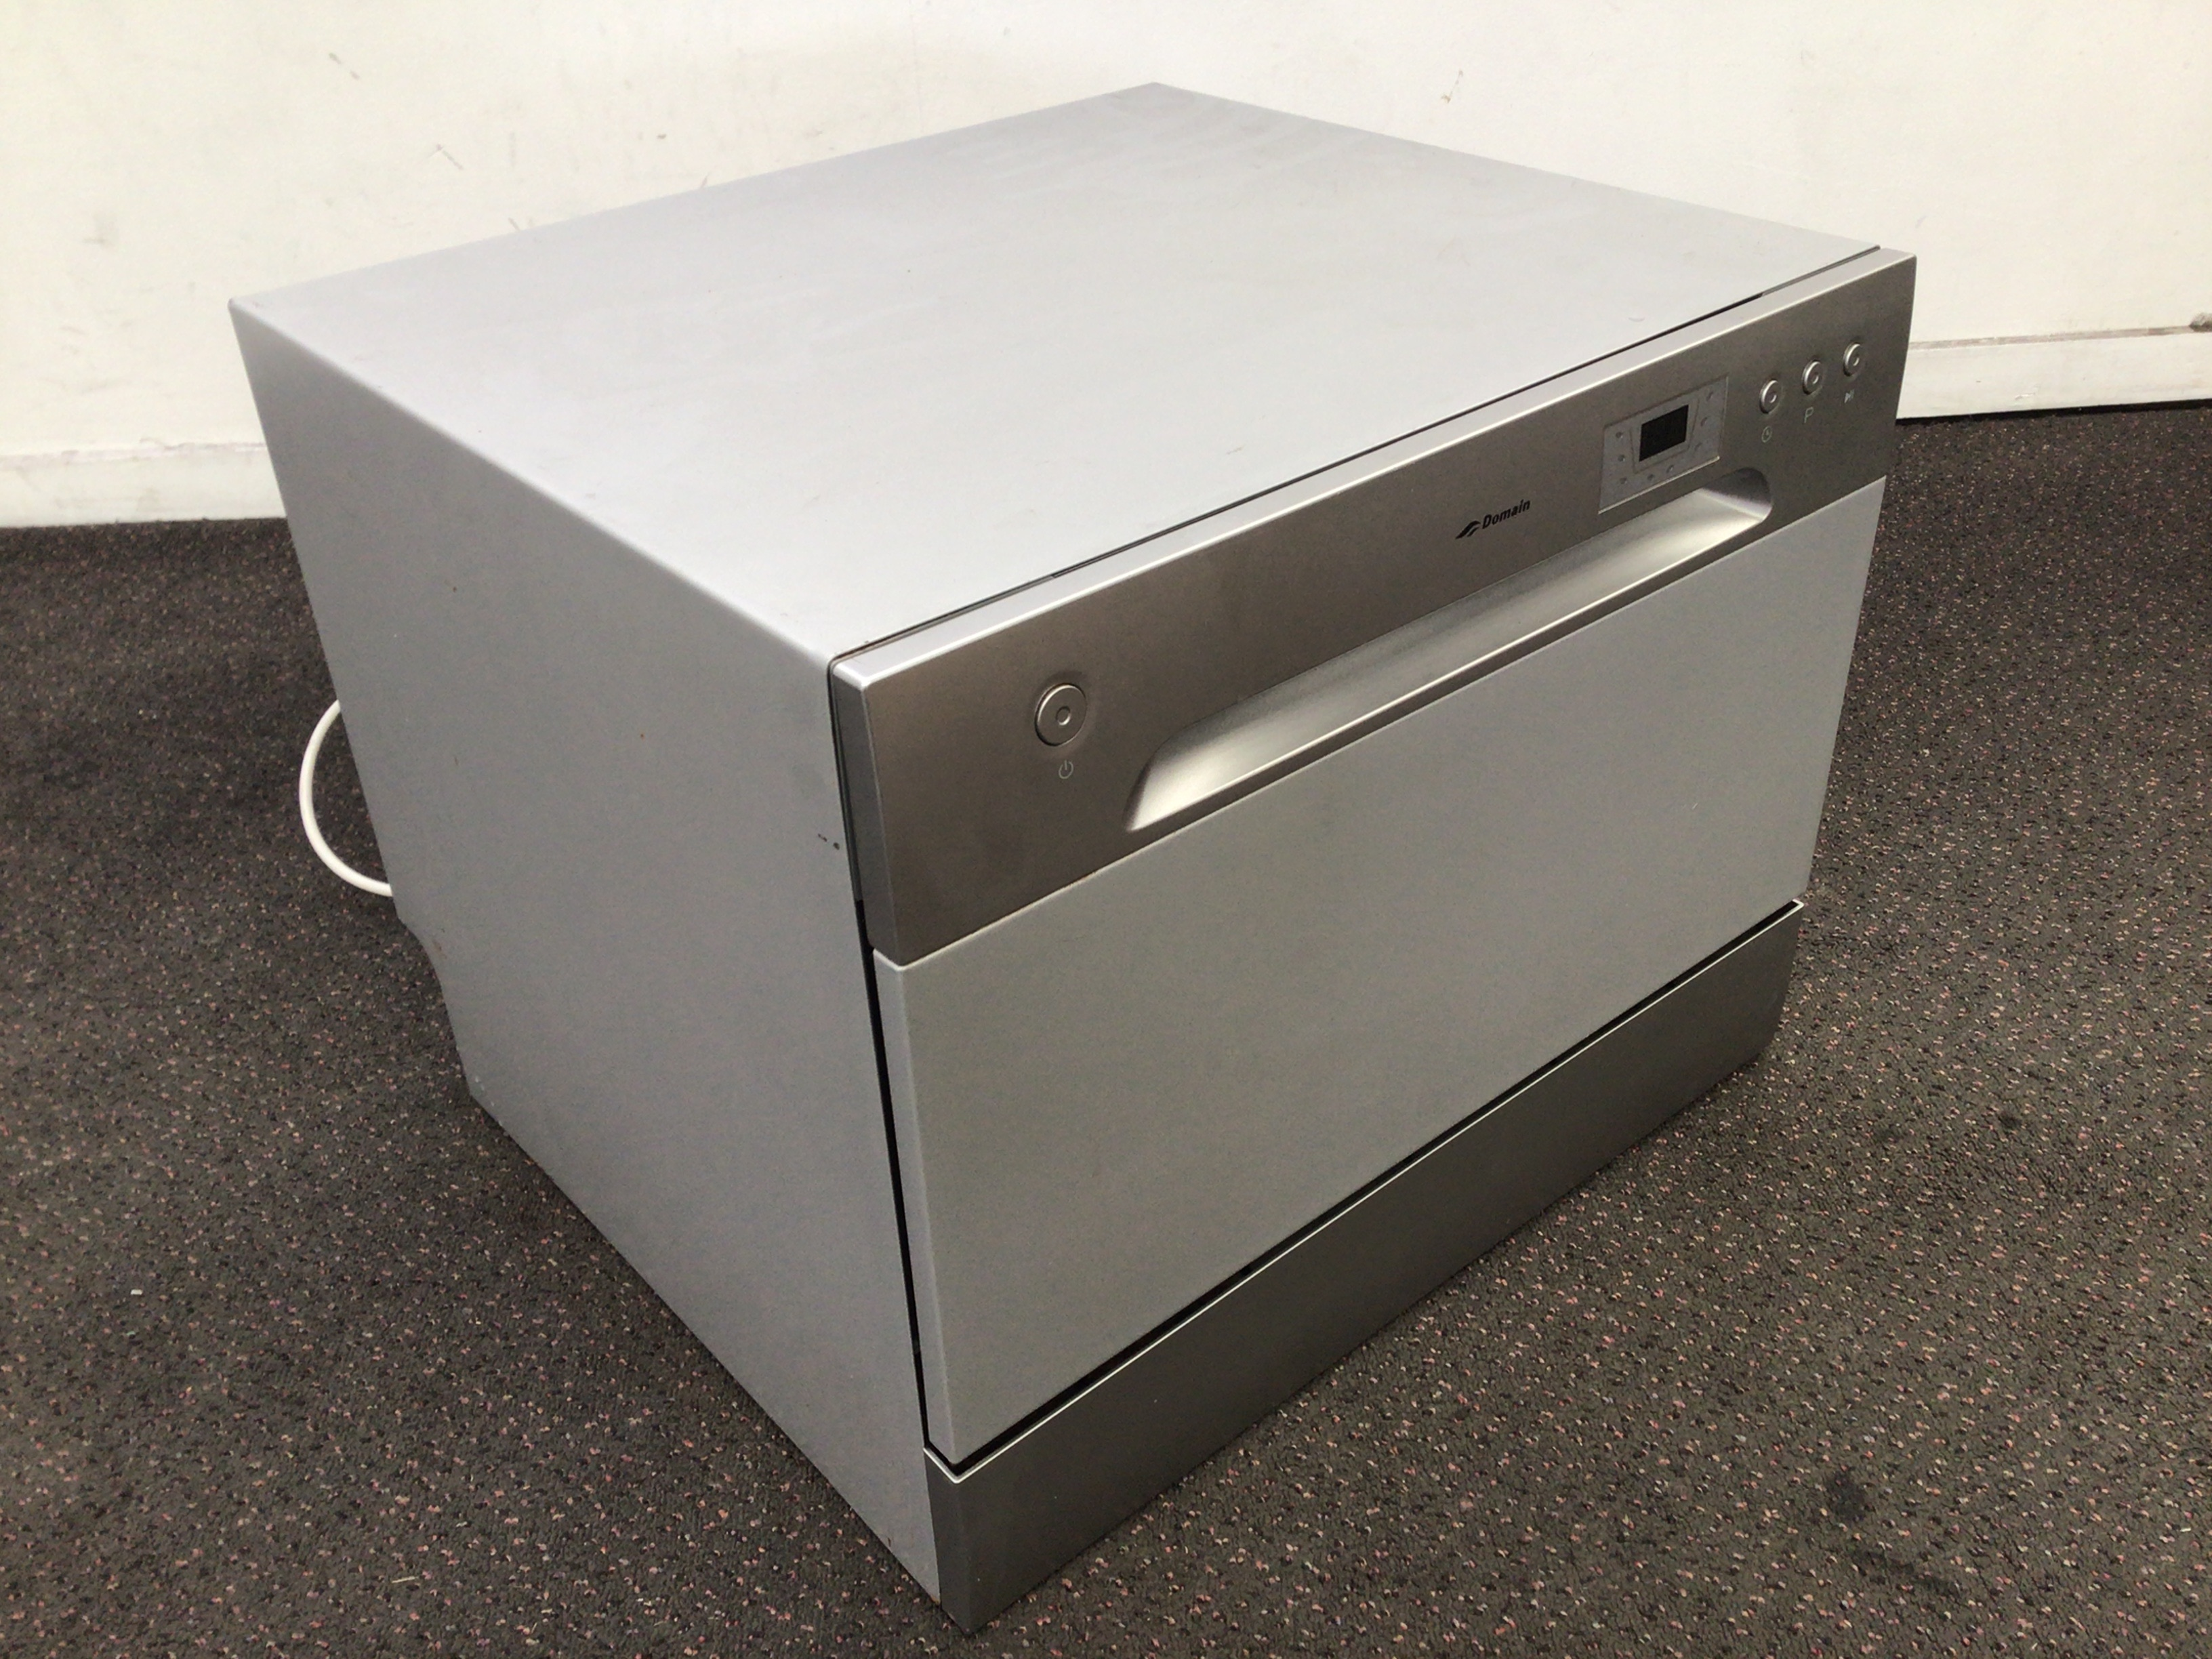 Domain DWB-S1 Dishwasher